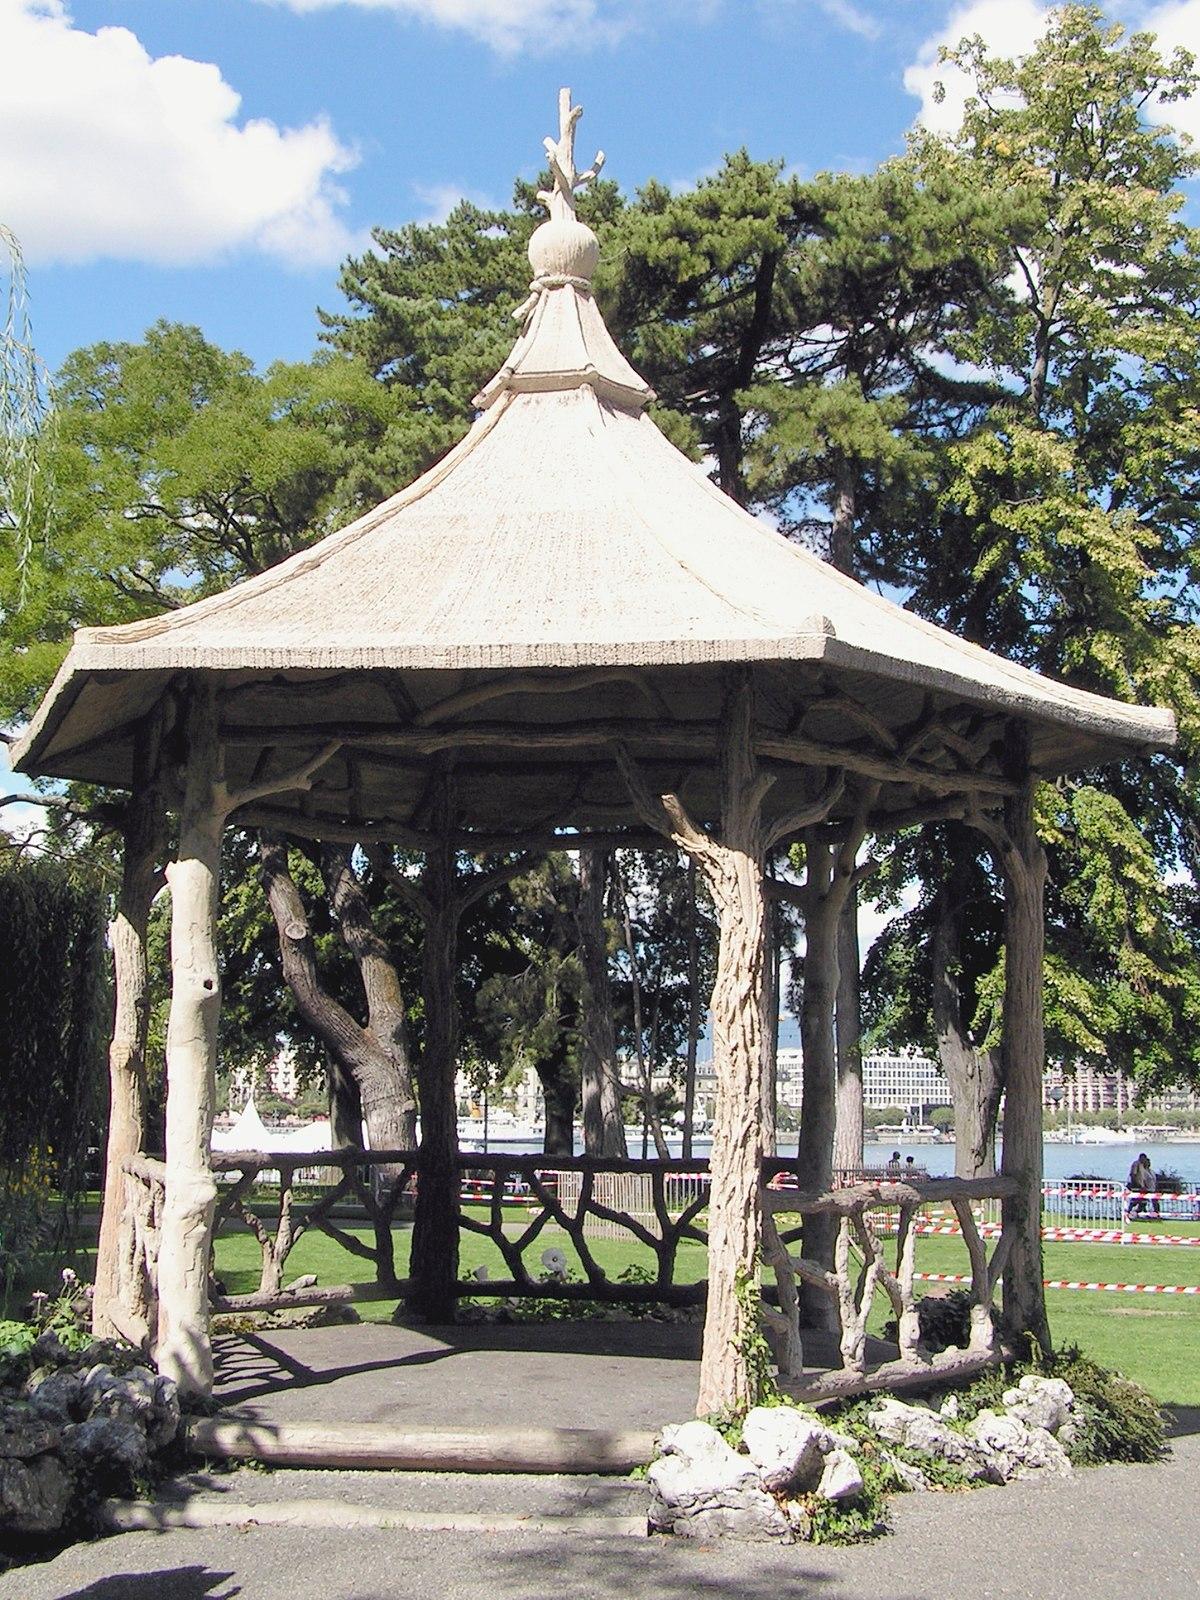 Jardin anglais ginevra wikipedia for Jardin anglais geneve programme